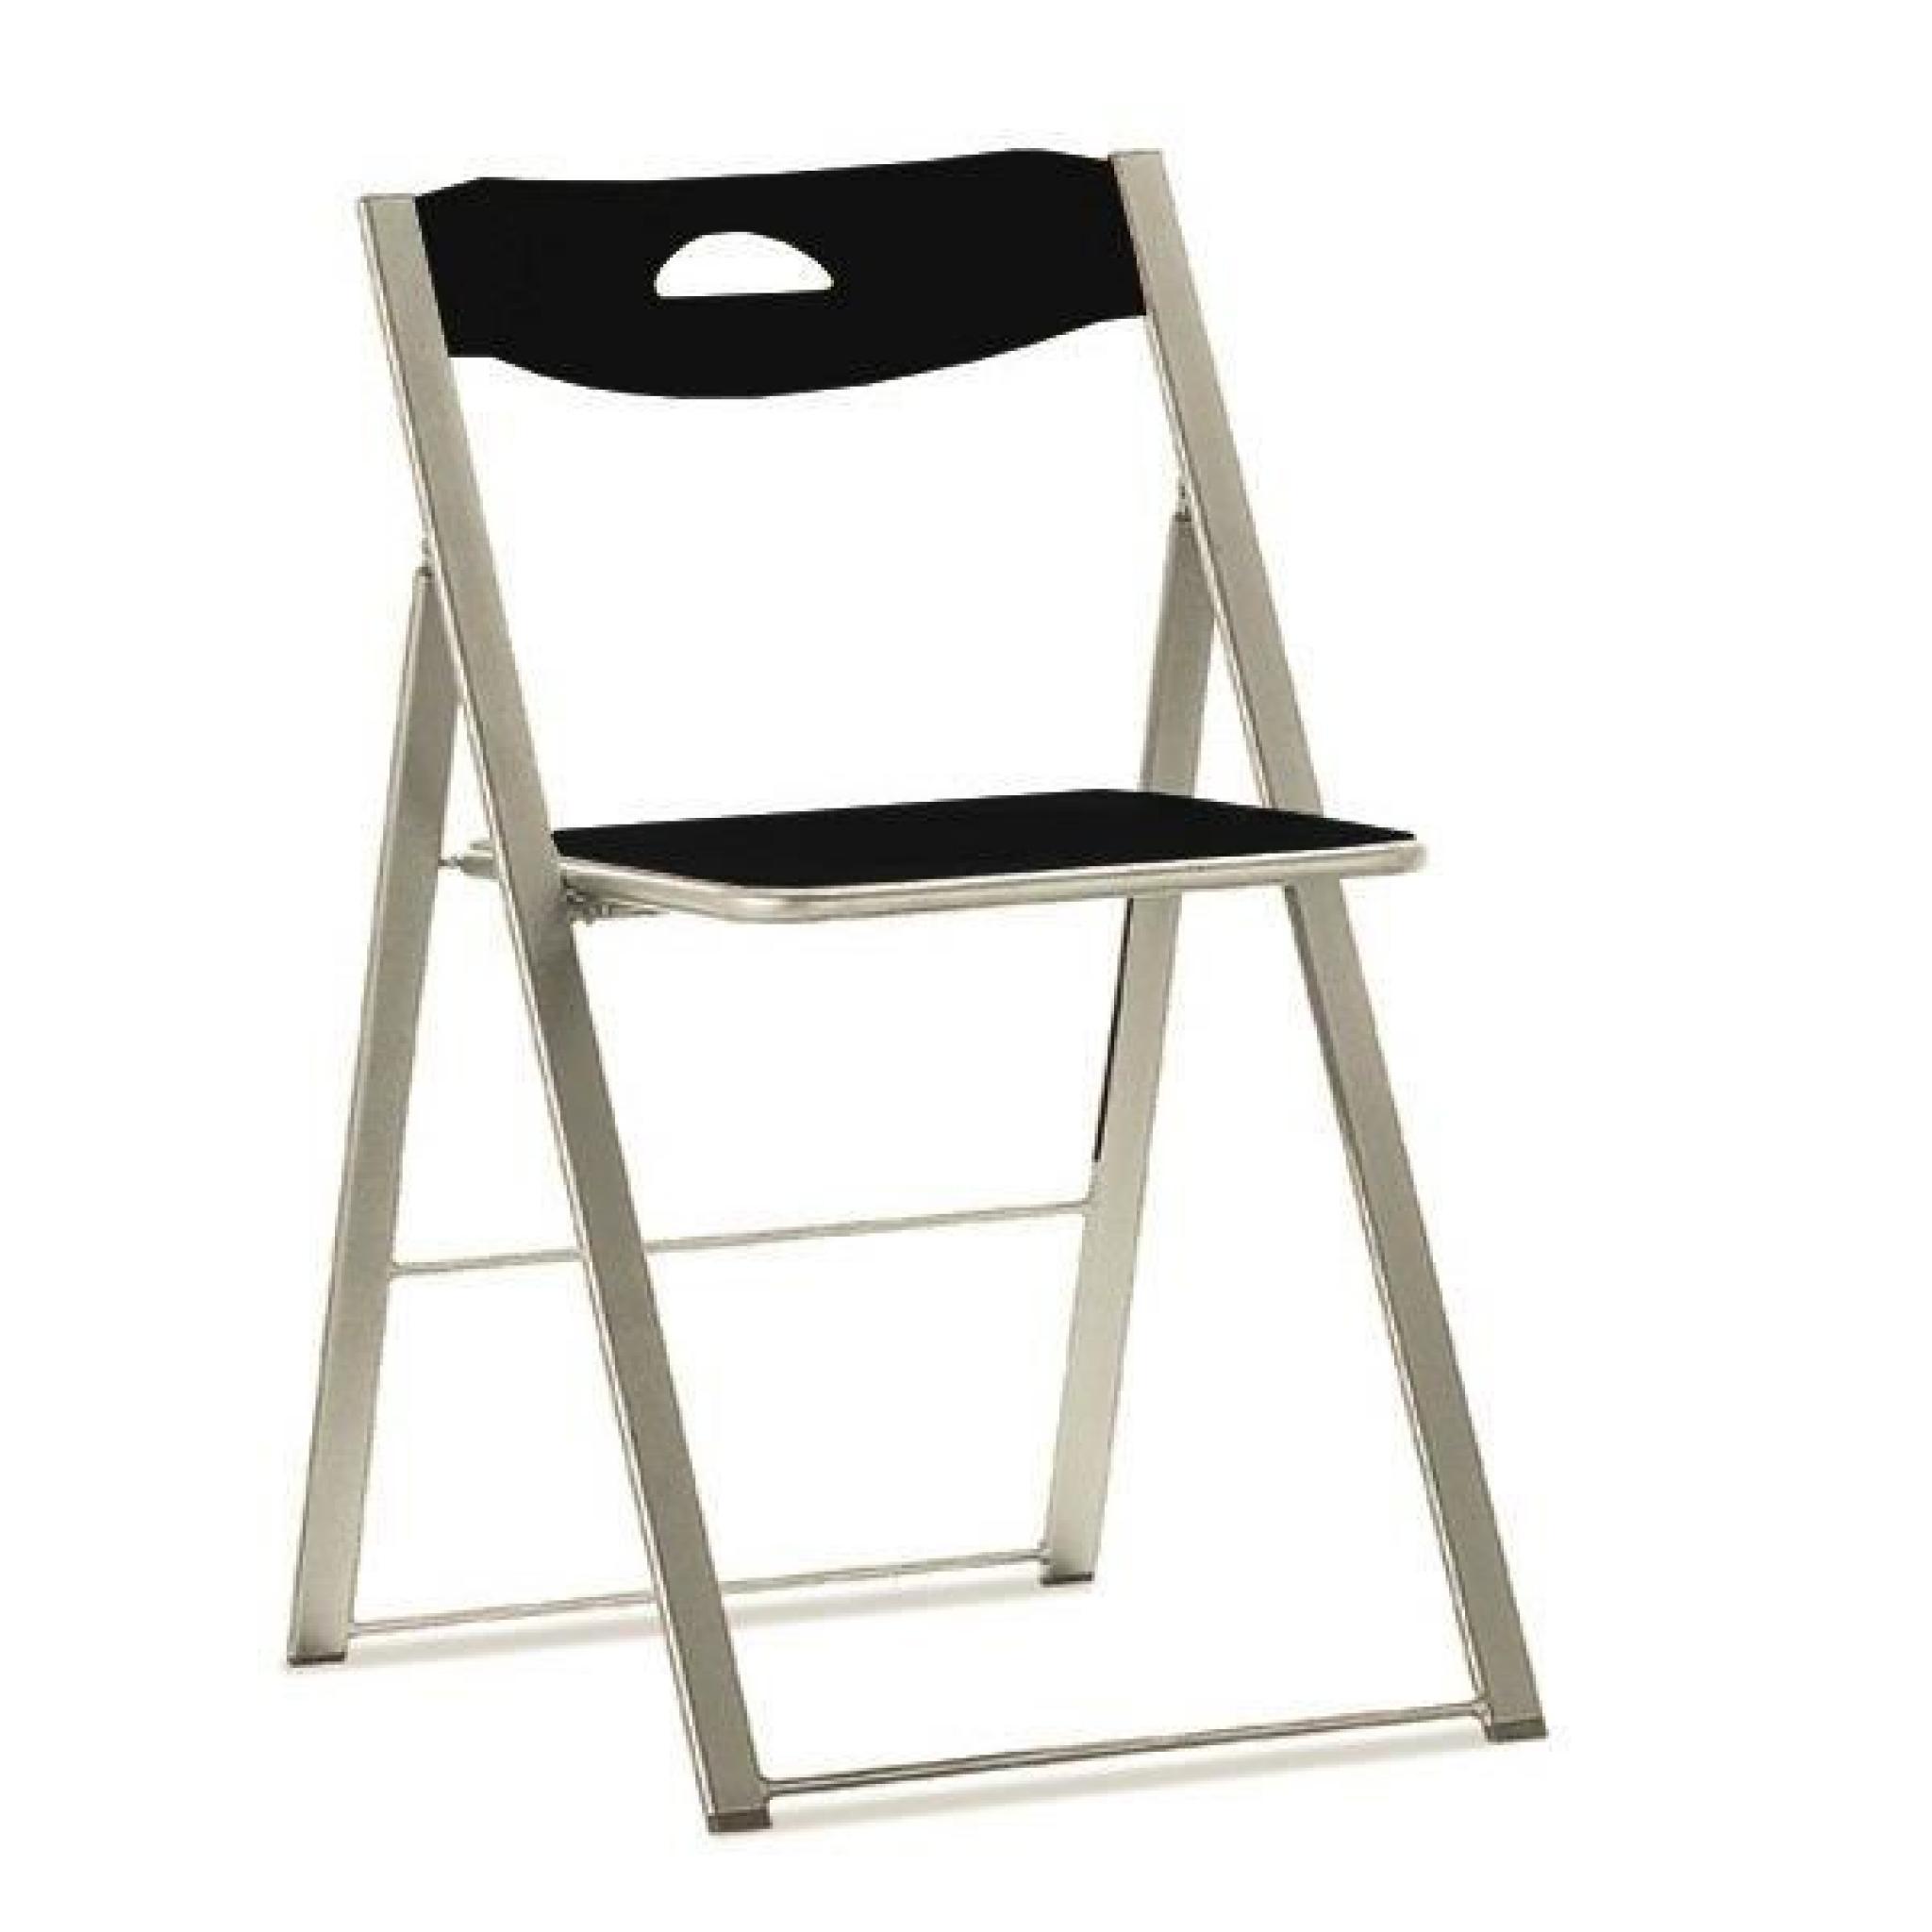 Chaise Pliante ICON Noire